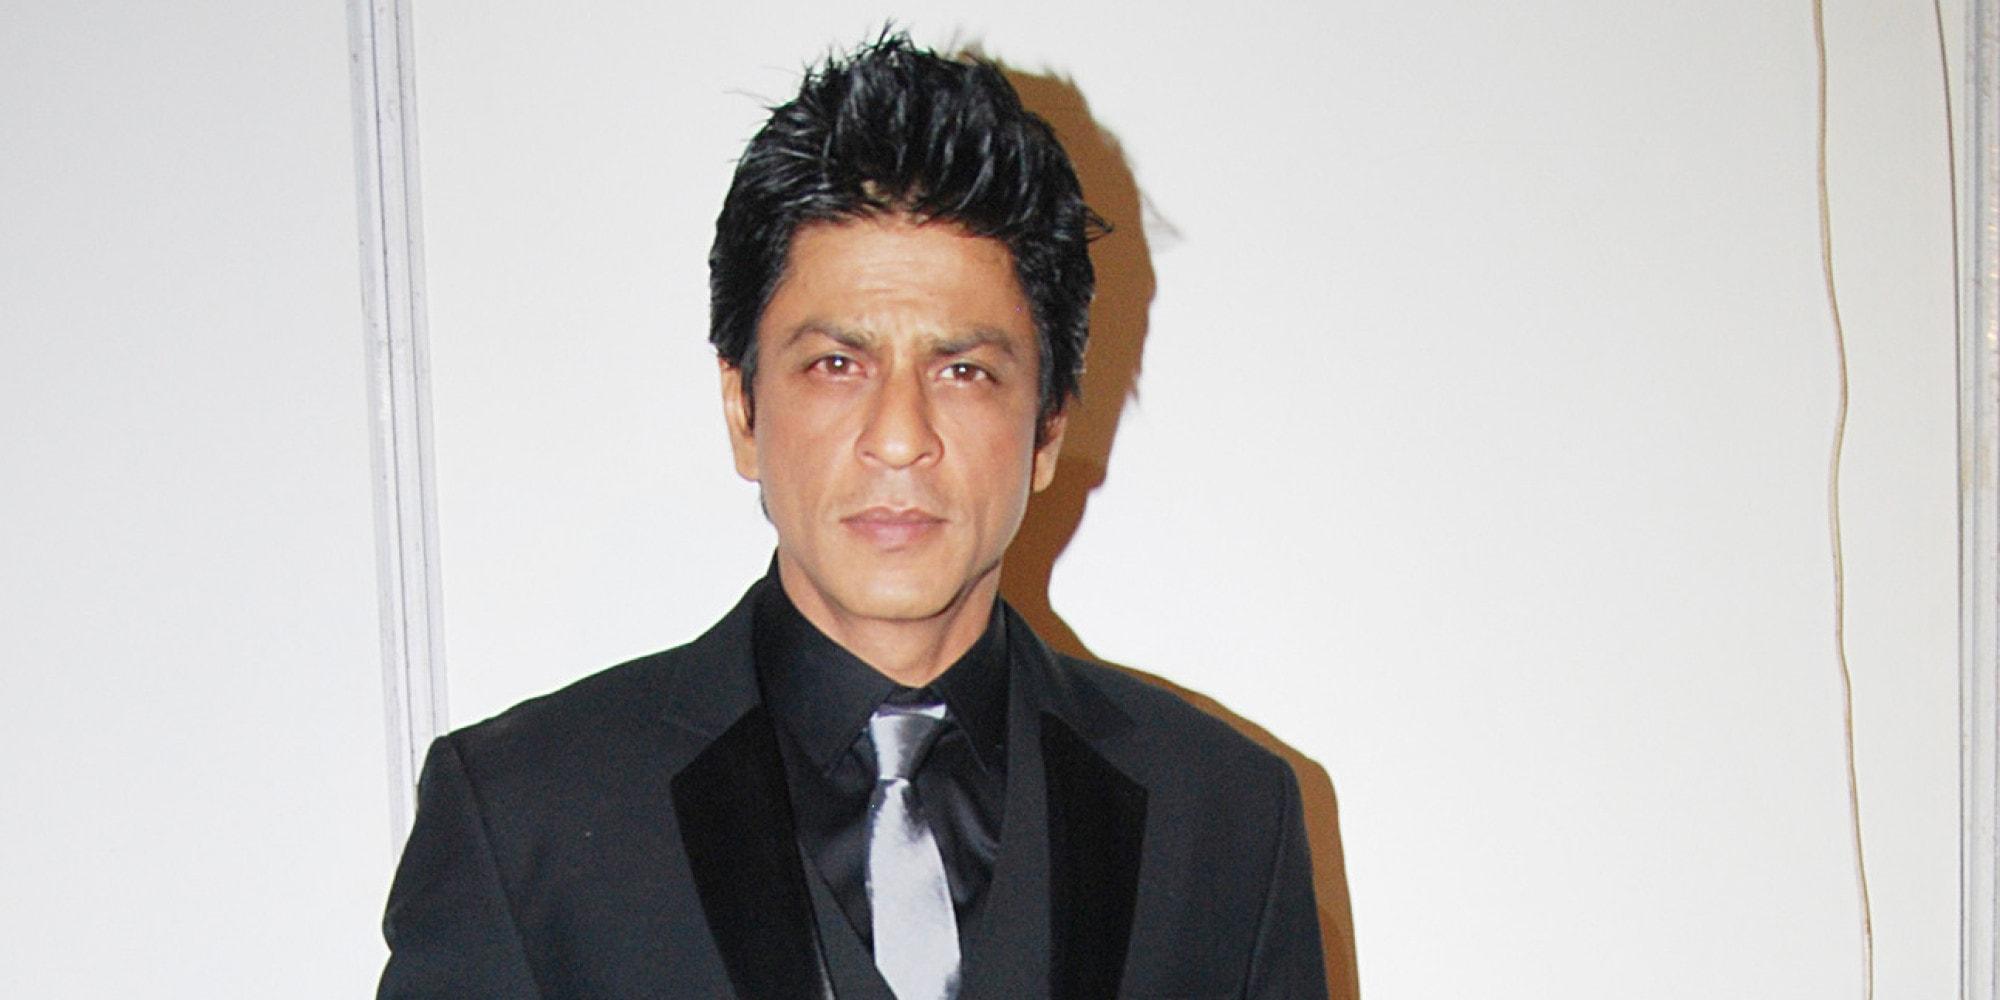 Shah Rukh Khan Desktop wallpaper